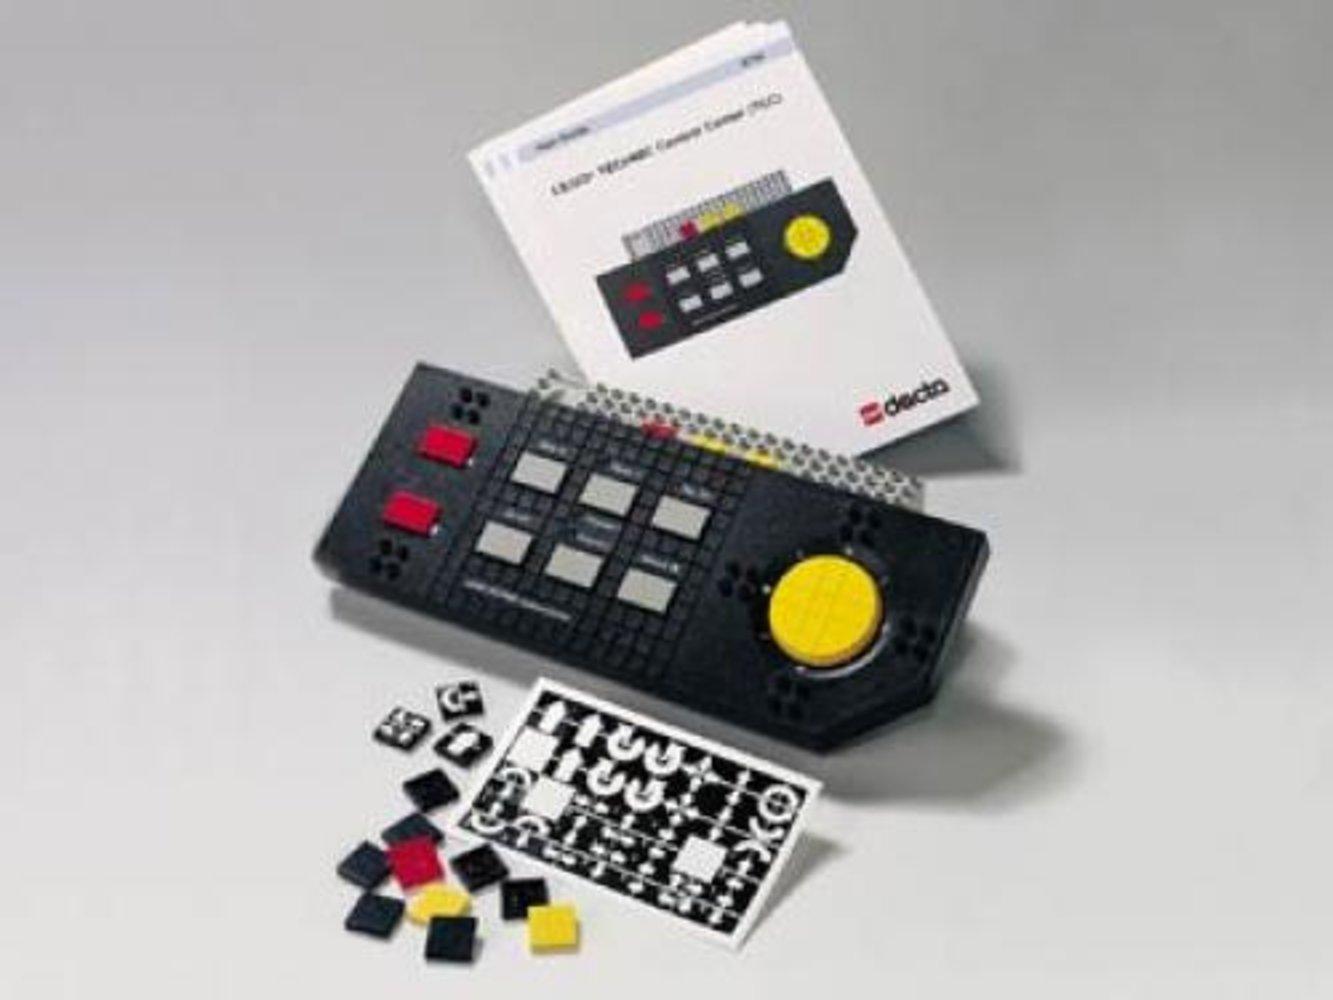 Technic Control Center II